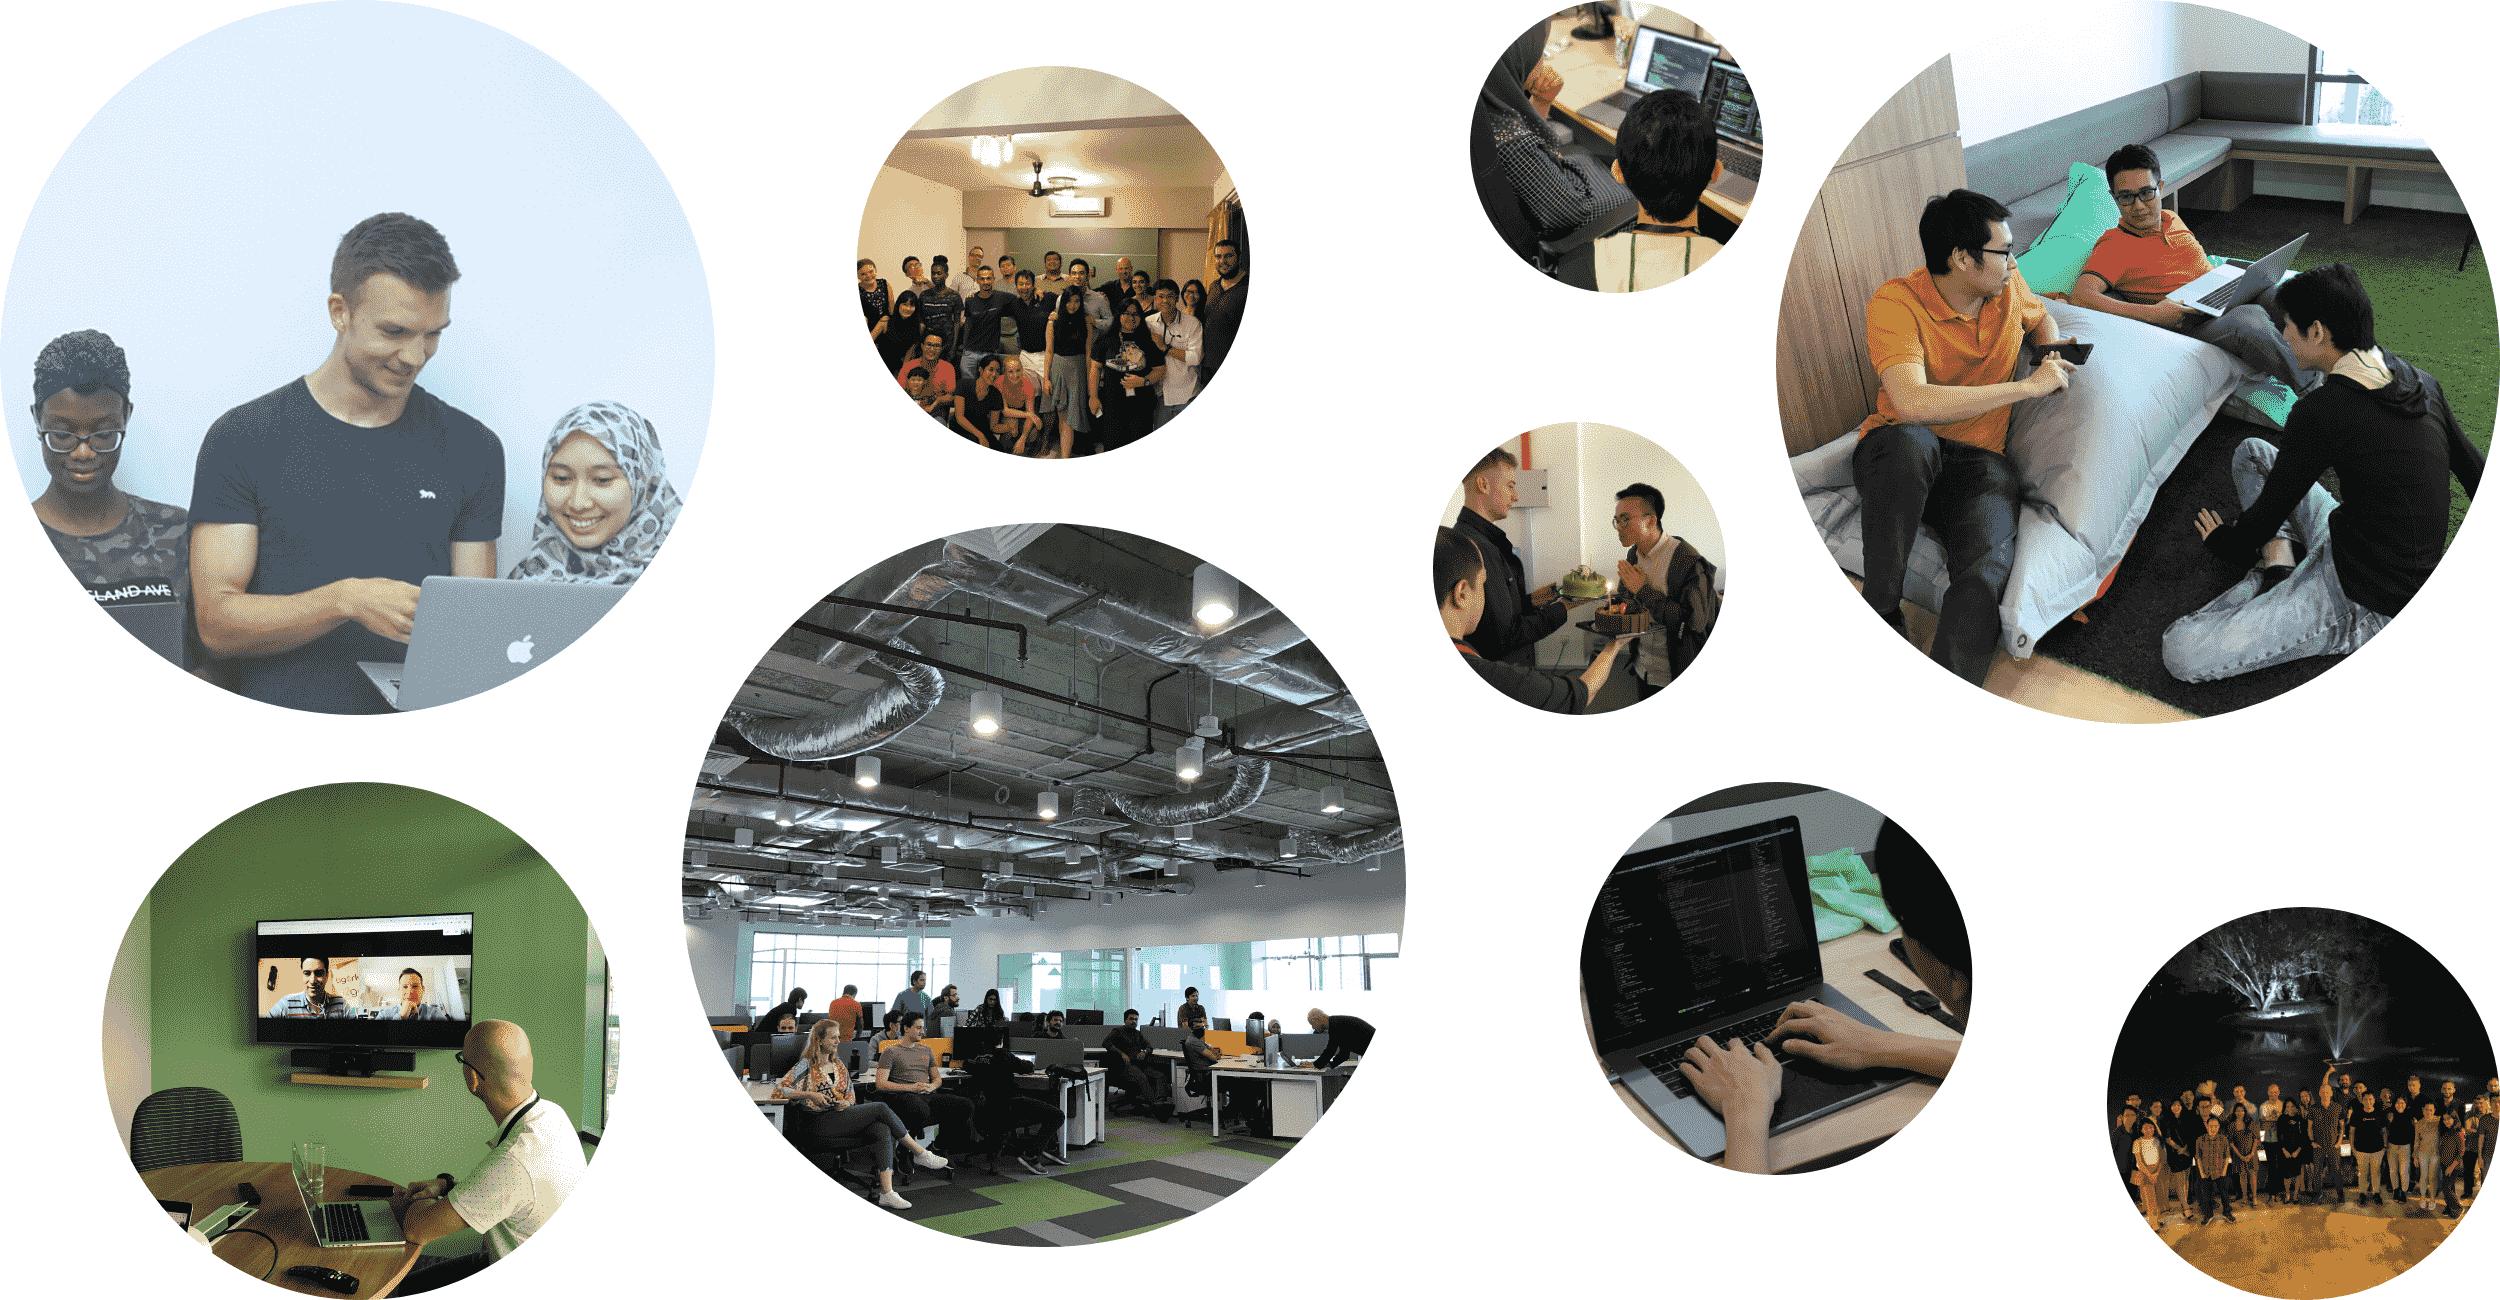 tigerlab team and office photos